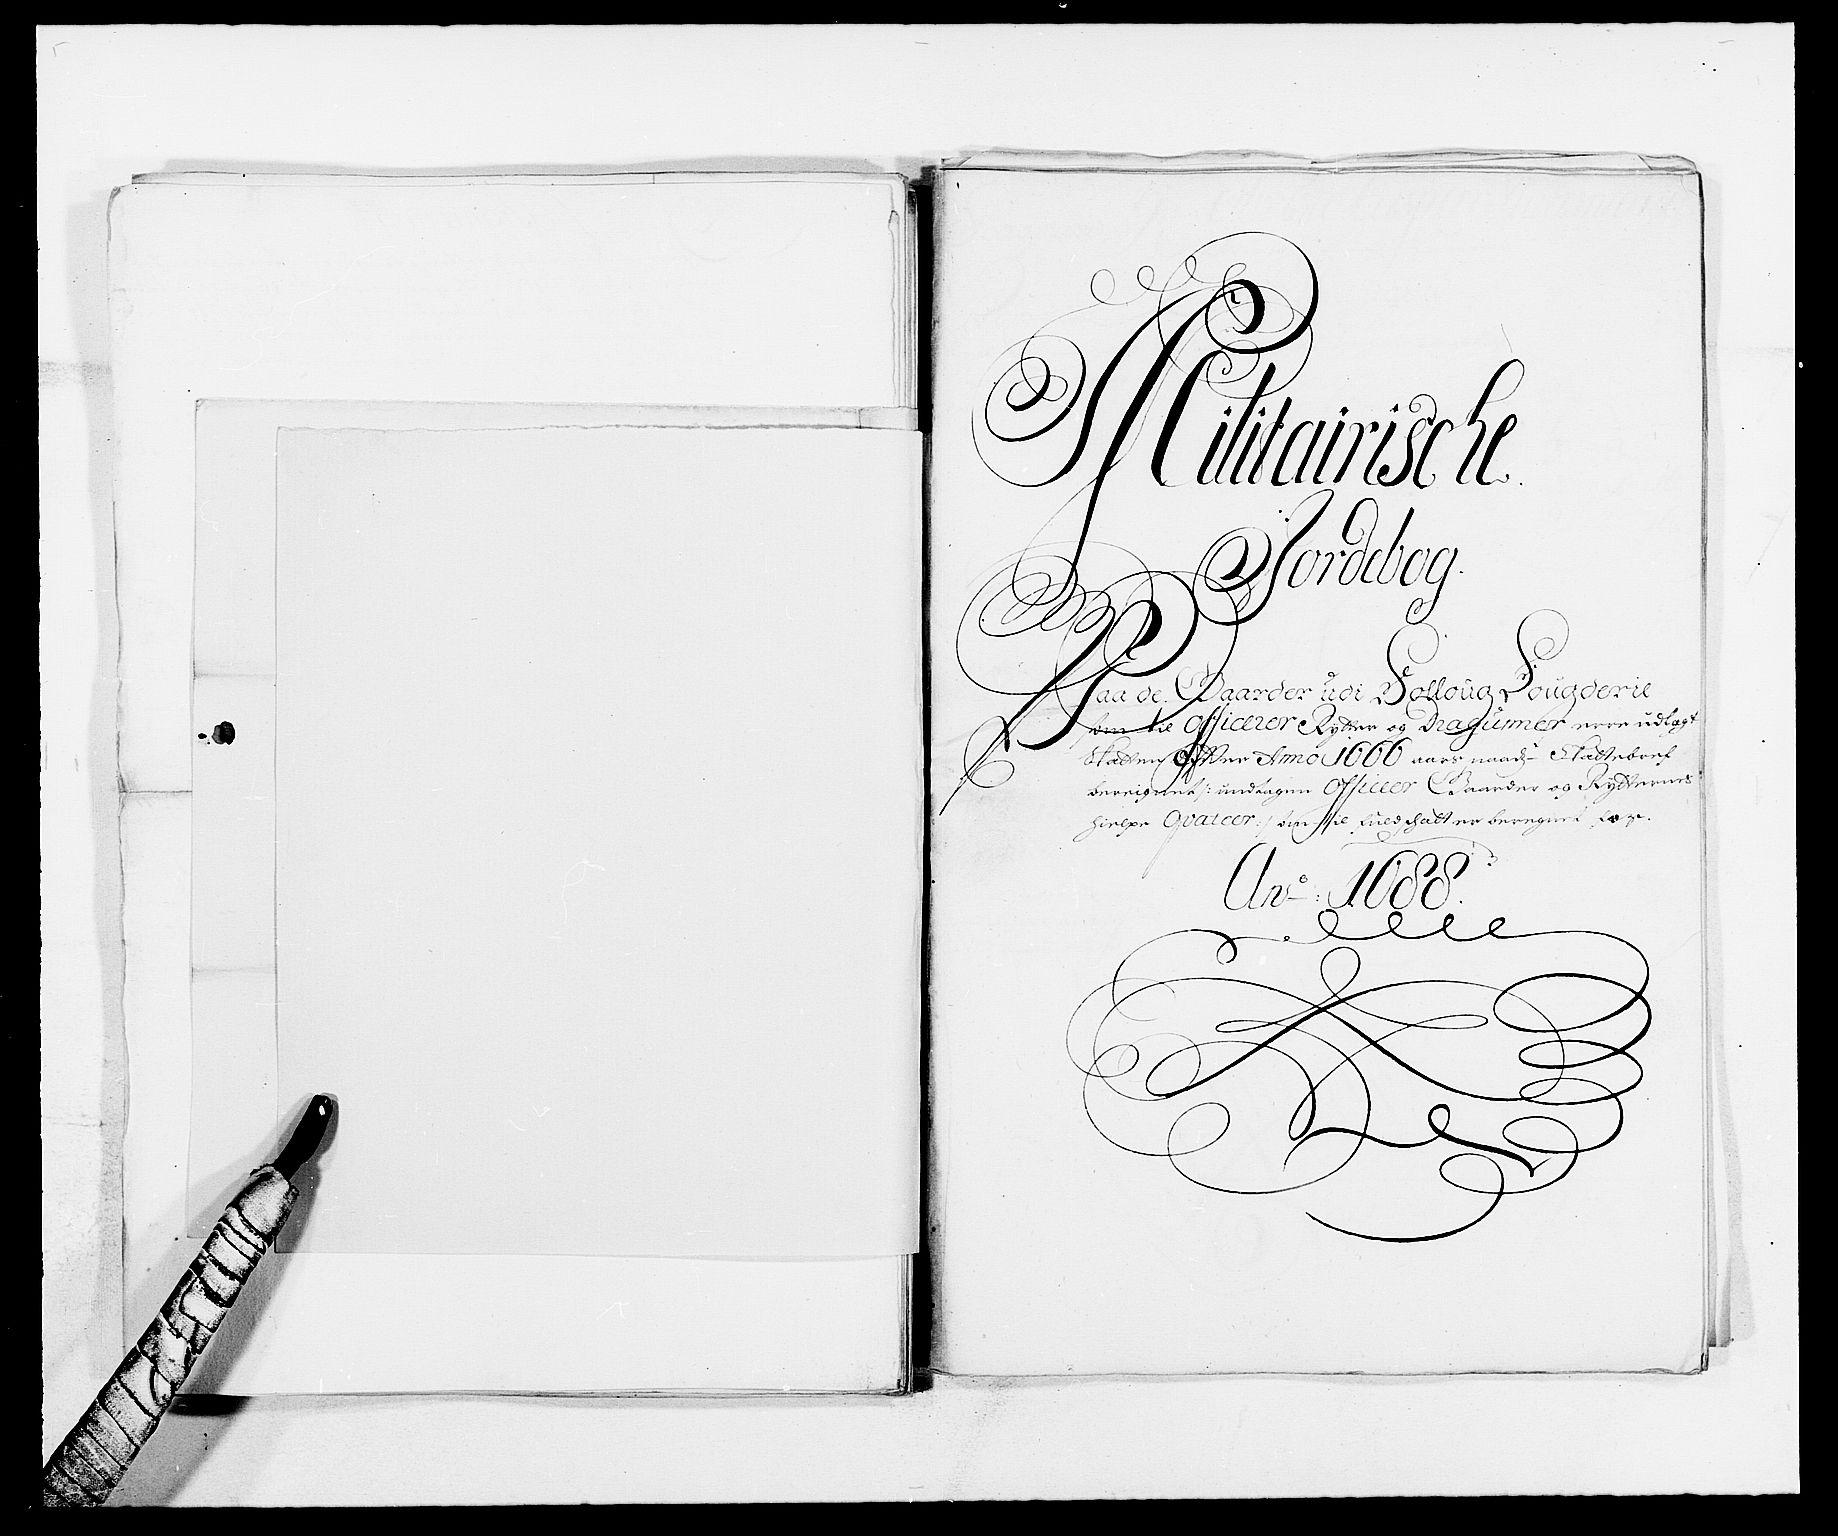 RA, Rentekammeret inntil 1814, Reviderte regnskaper, Fogderegnskap, R09/L0436: Fogderegnskap Follo, 1685-1691, s. 148